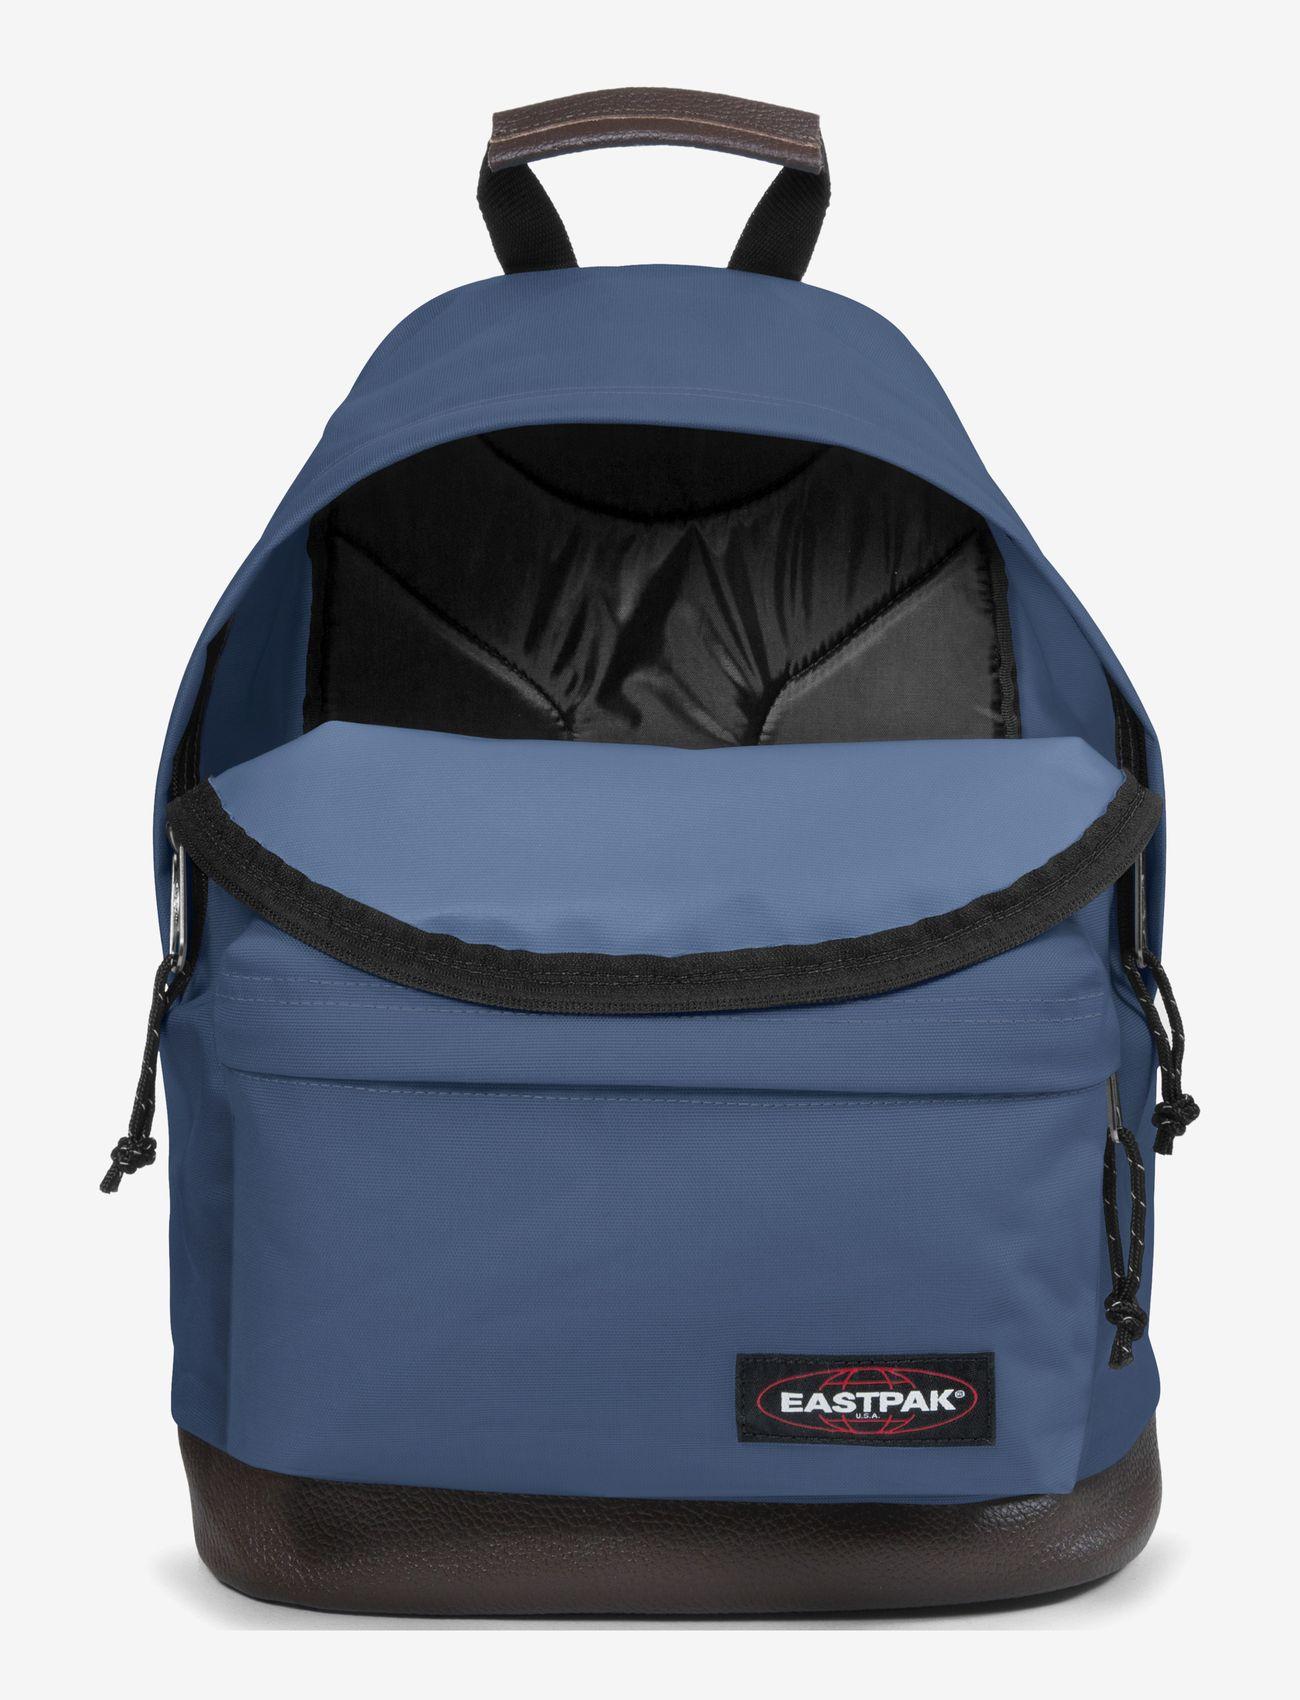 Eastpak - WYOMING - ryggsäckar - humble blue - 1